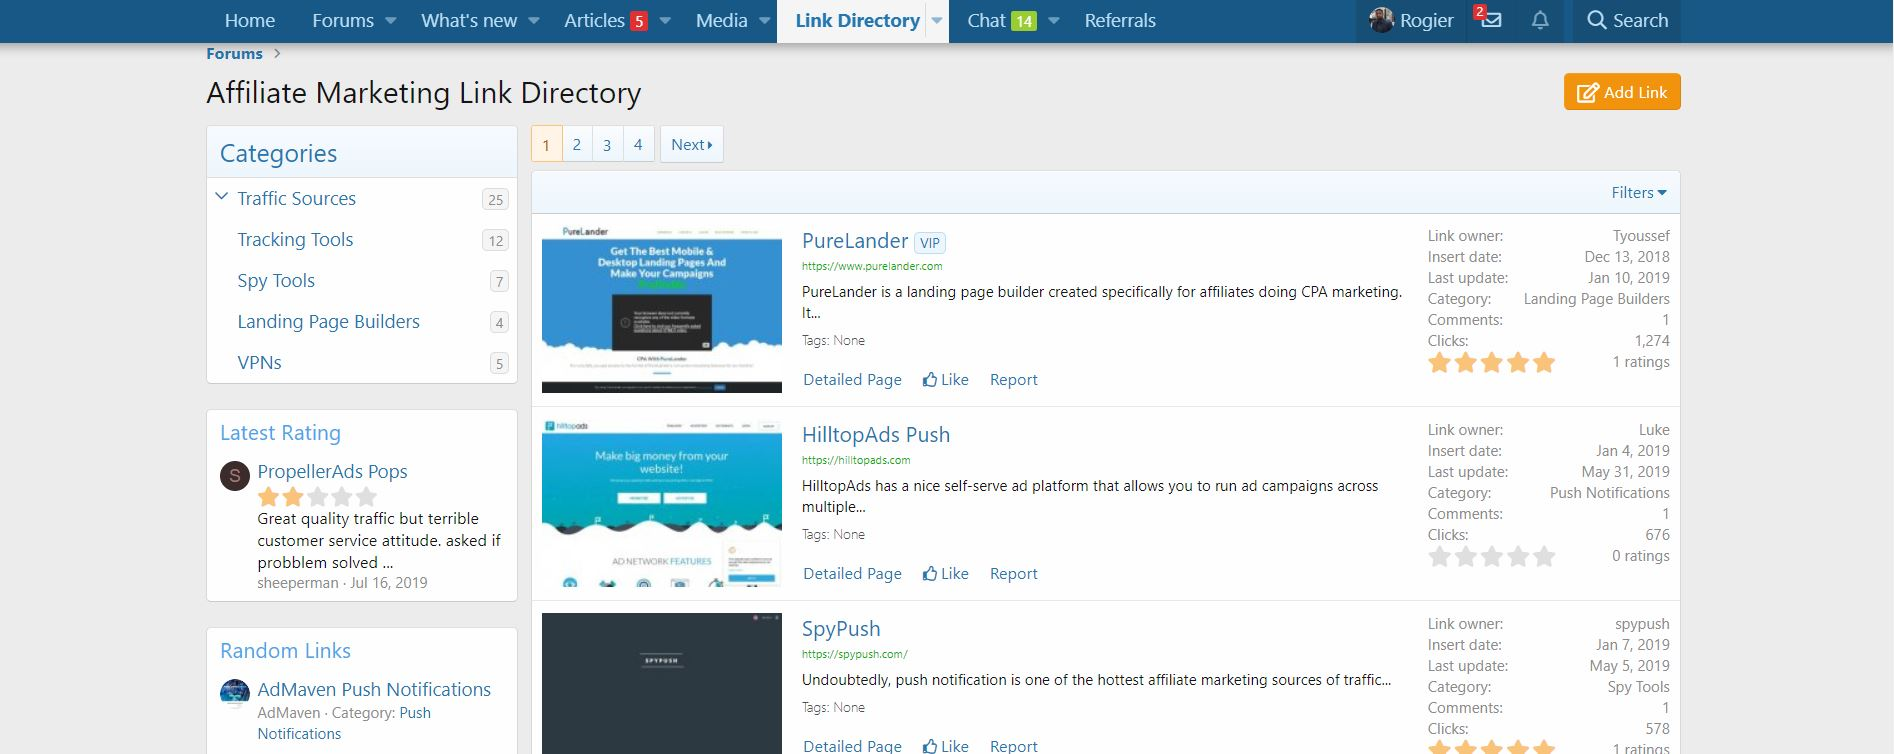 afflift link directory